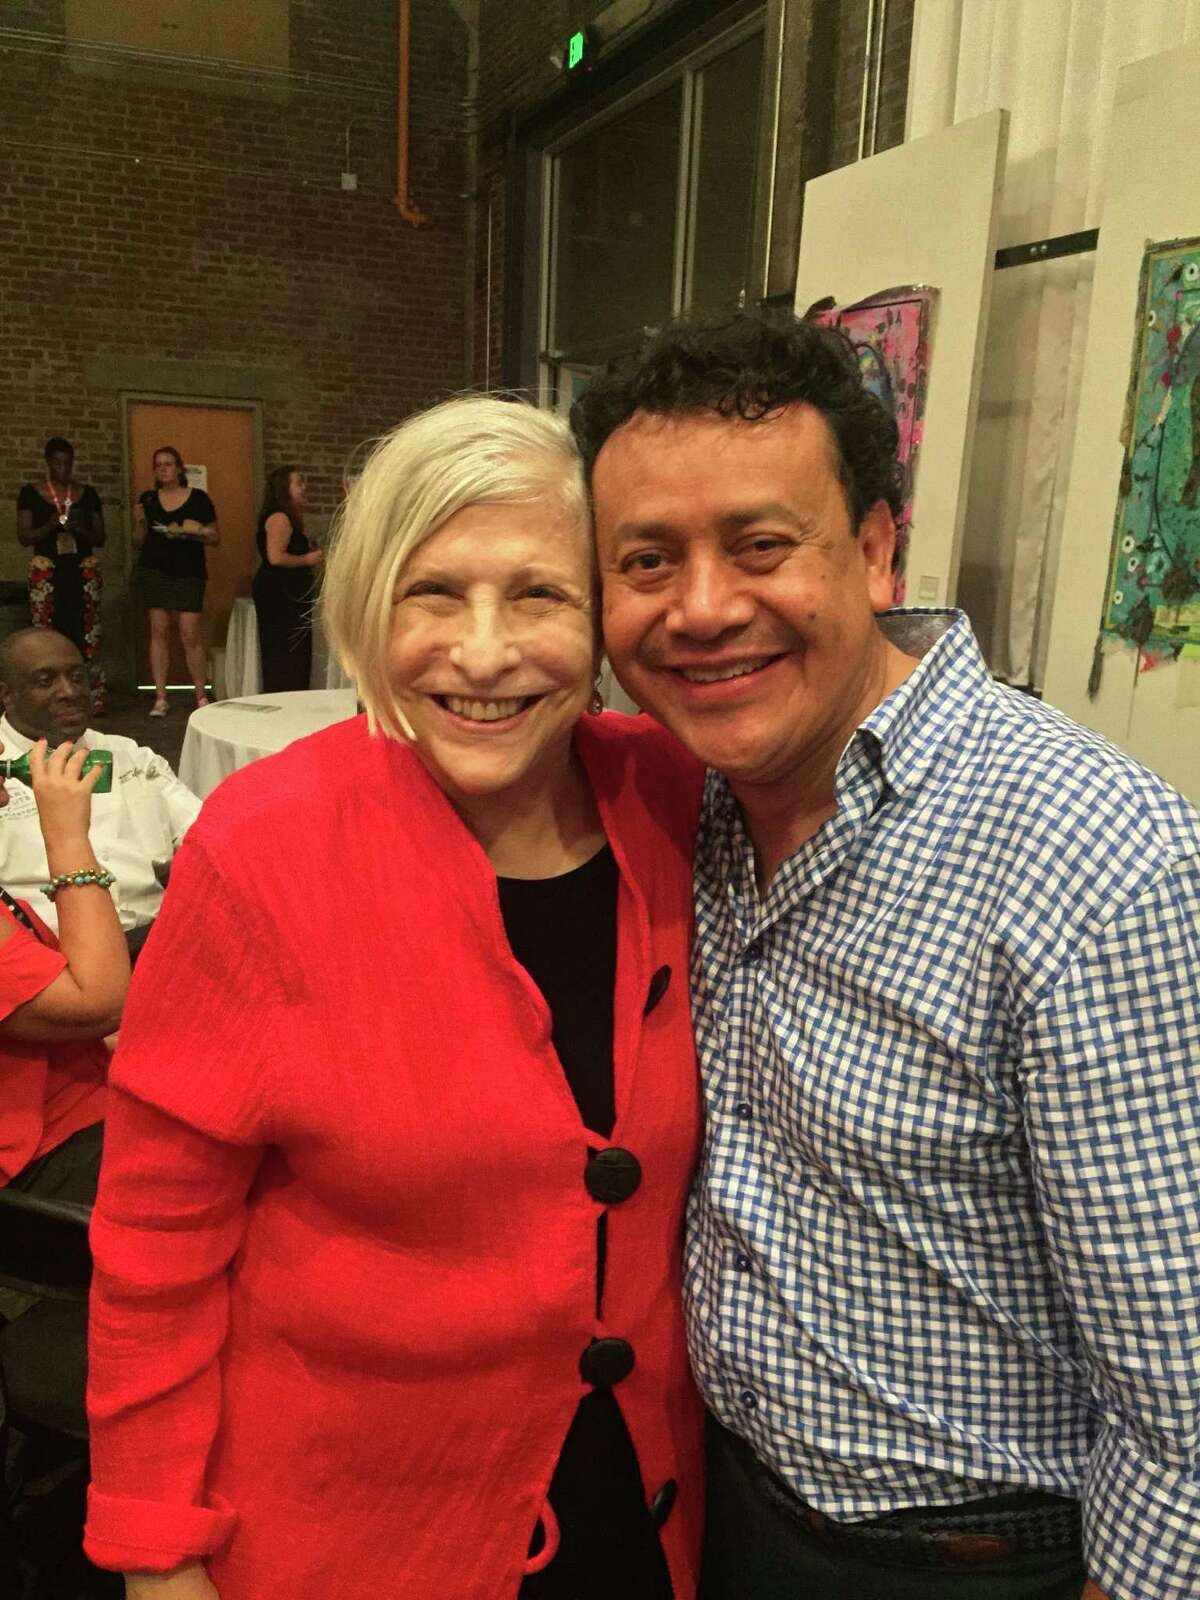 Cookbook author Nathalie Dupree and Hugo Ortega at the 2017 Southern Foodways Alliance symposium. The SFA presented Ortega with the 2017 Craig Claiborne Lifetime Achievement Award.